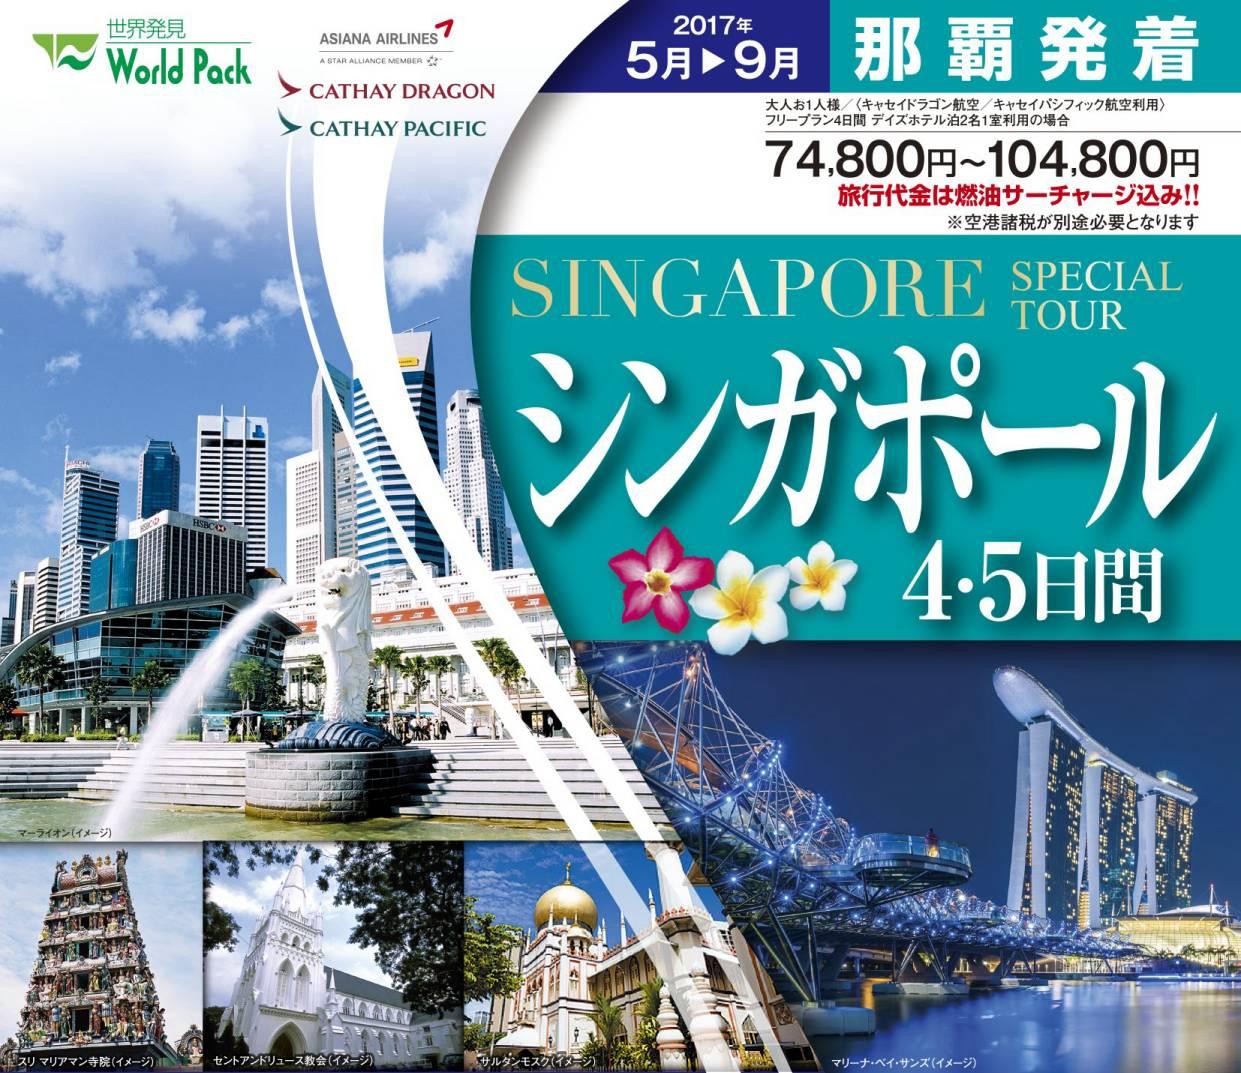 twv_singapore17_05-09_01